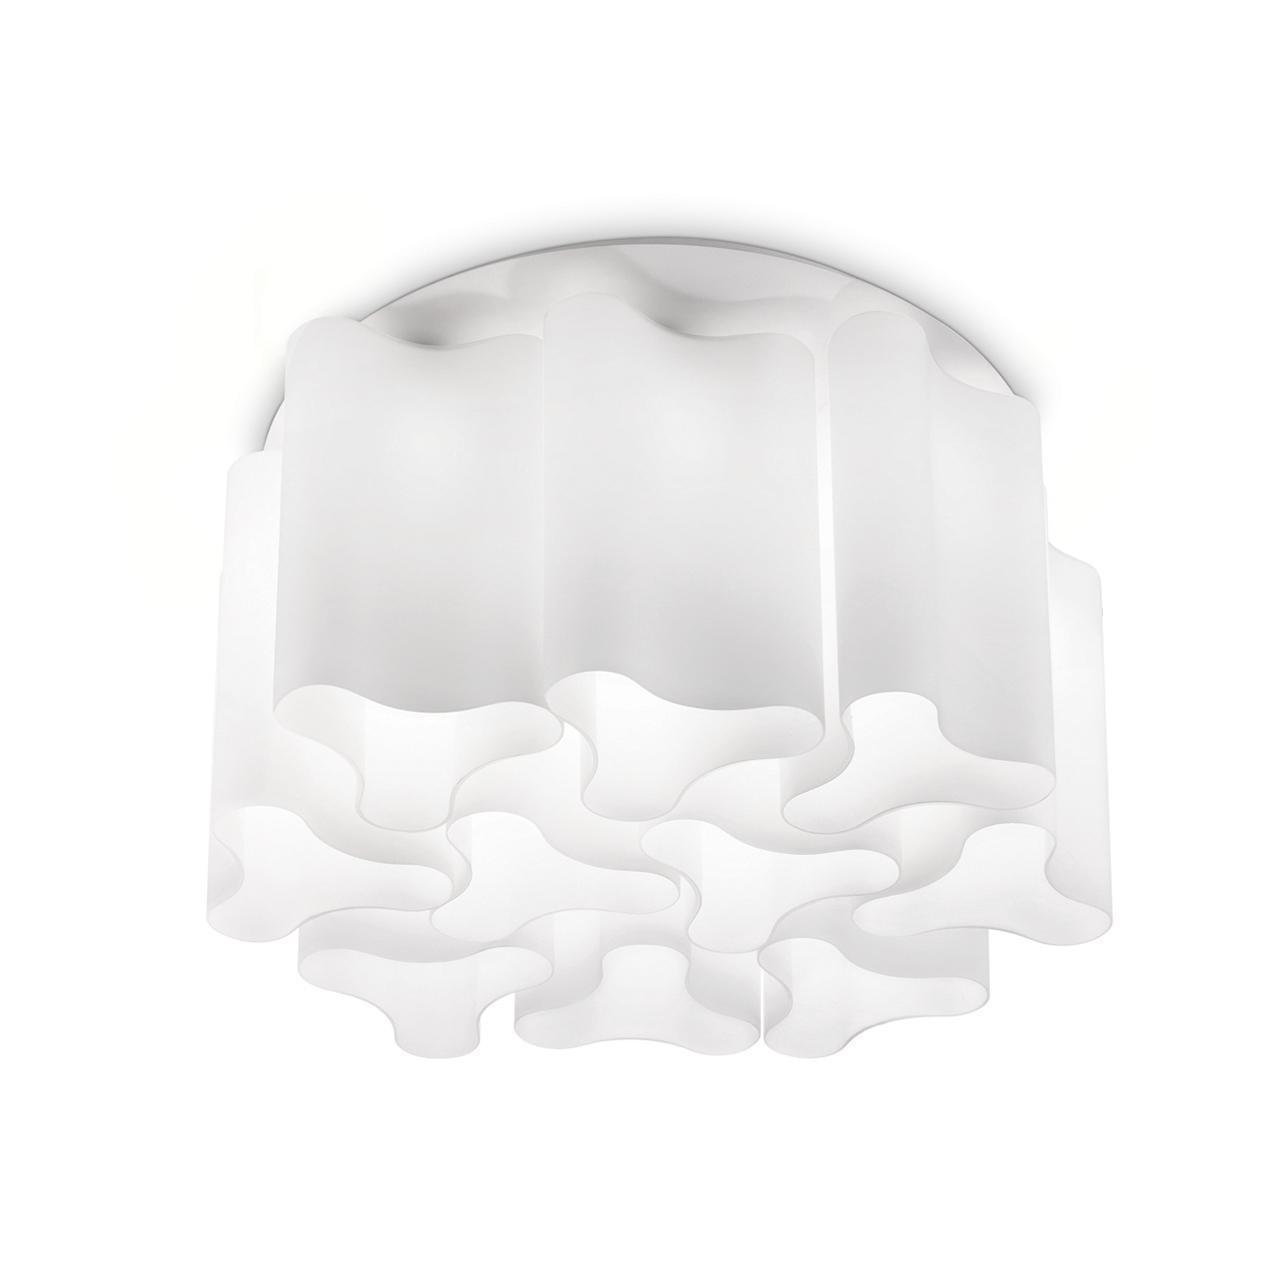 Потолочная люстра Ideal Lux Compo PL10 Bianco потолочная чаша ideal lux cup msb3 bianco 122854